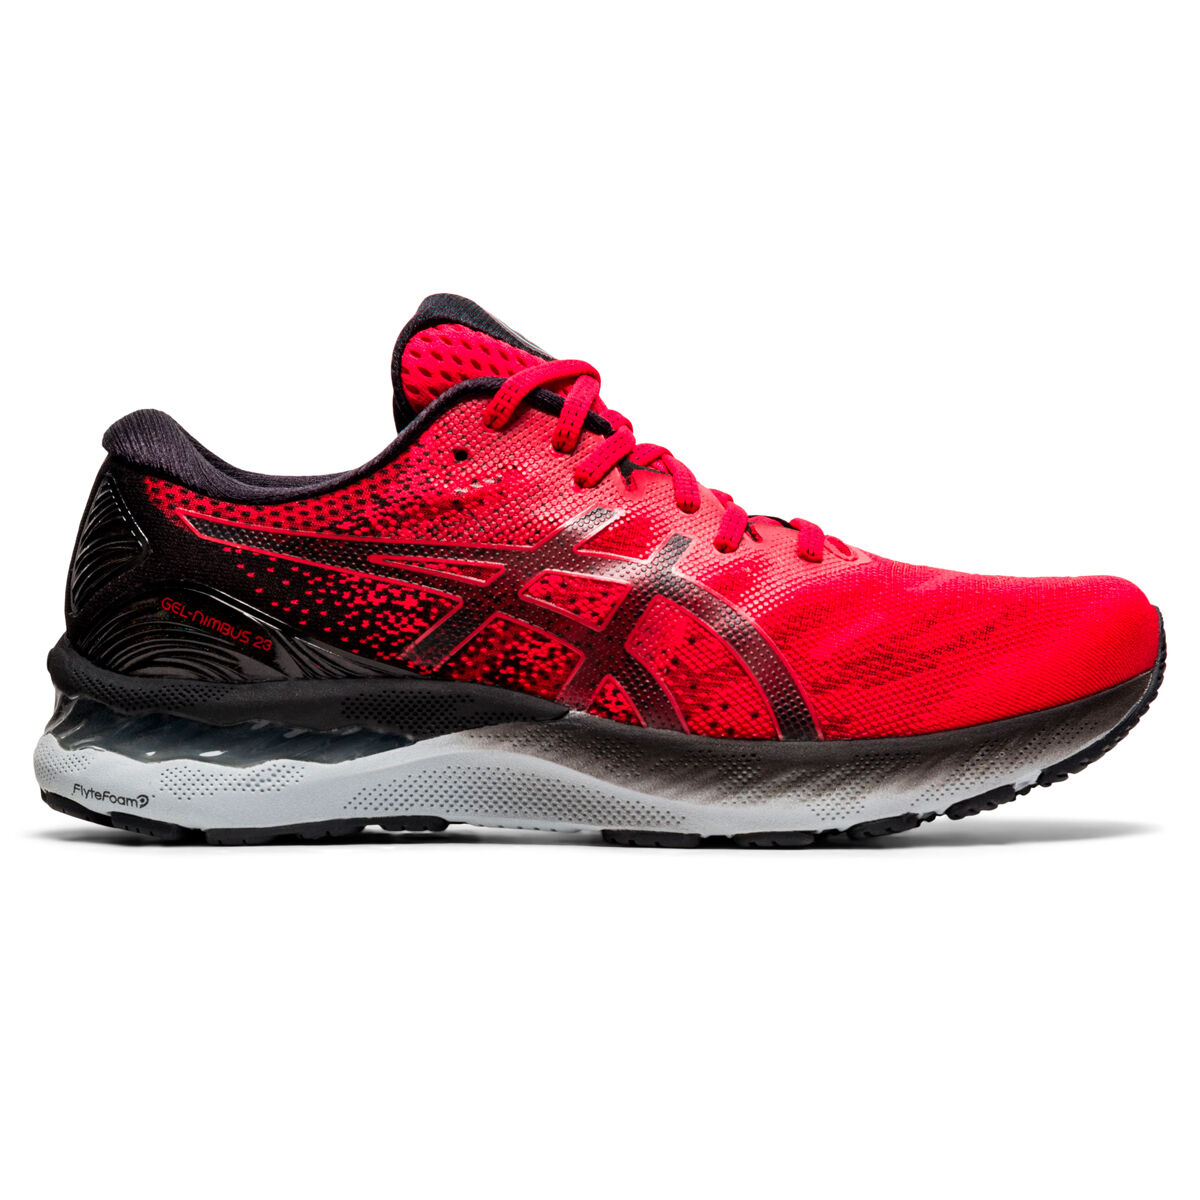 Asics GEL Nimbus 23 Mens Running Shoes